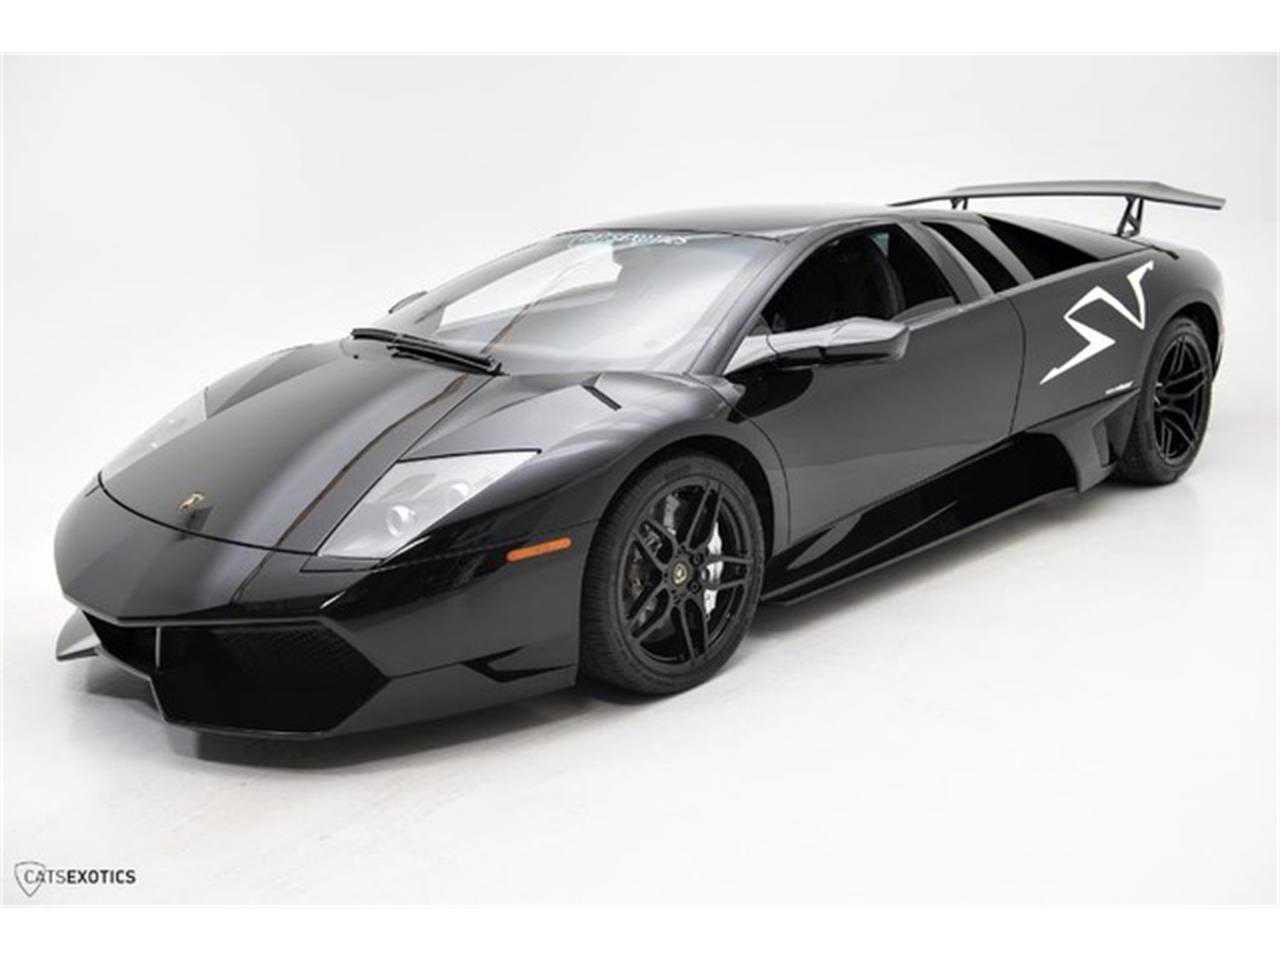 2010 Lamborghini Murcielago For Sale In Seattle Wa Zhwbu8ah7ala03889